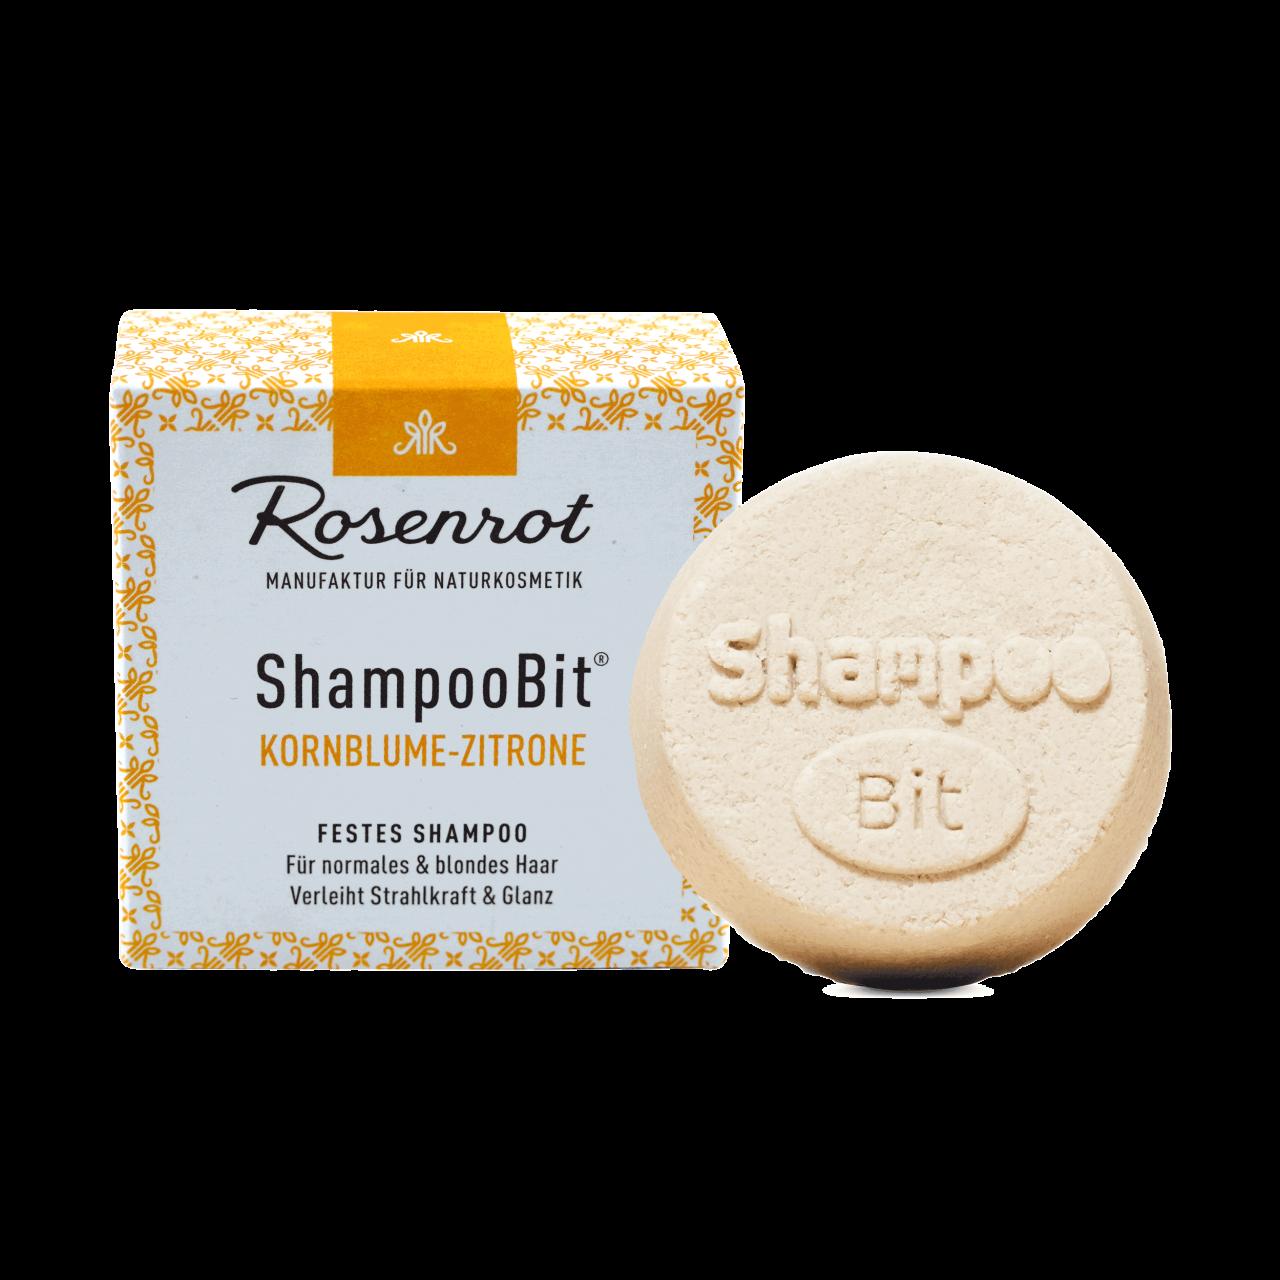 ShampooBit® - festes Shampoo Kornblume-Zitrone